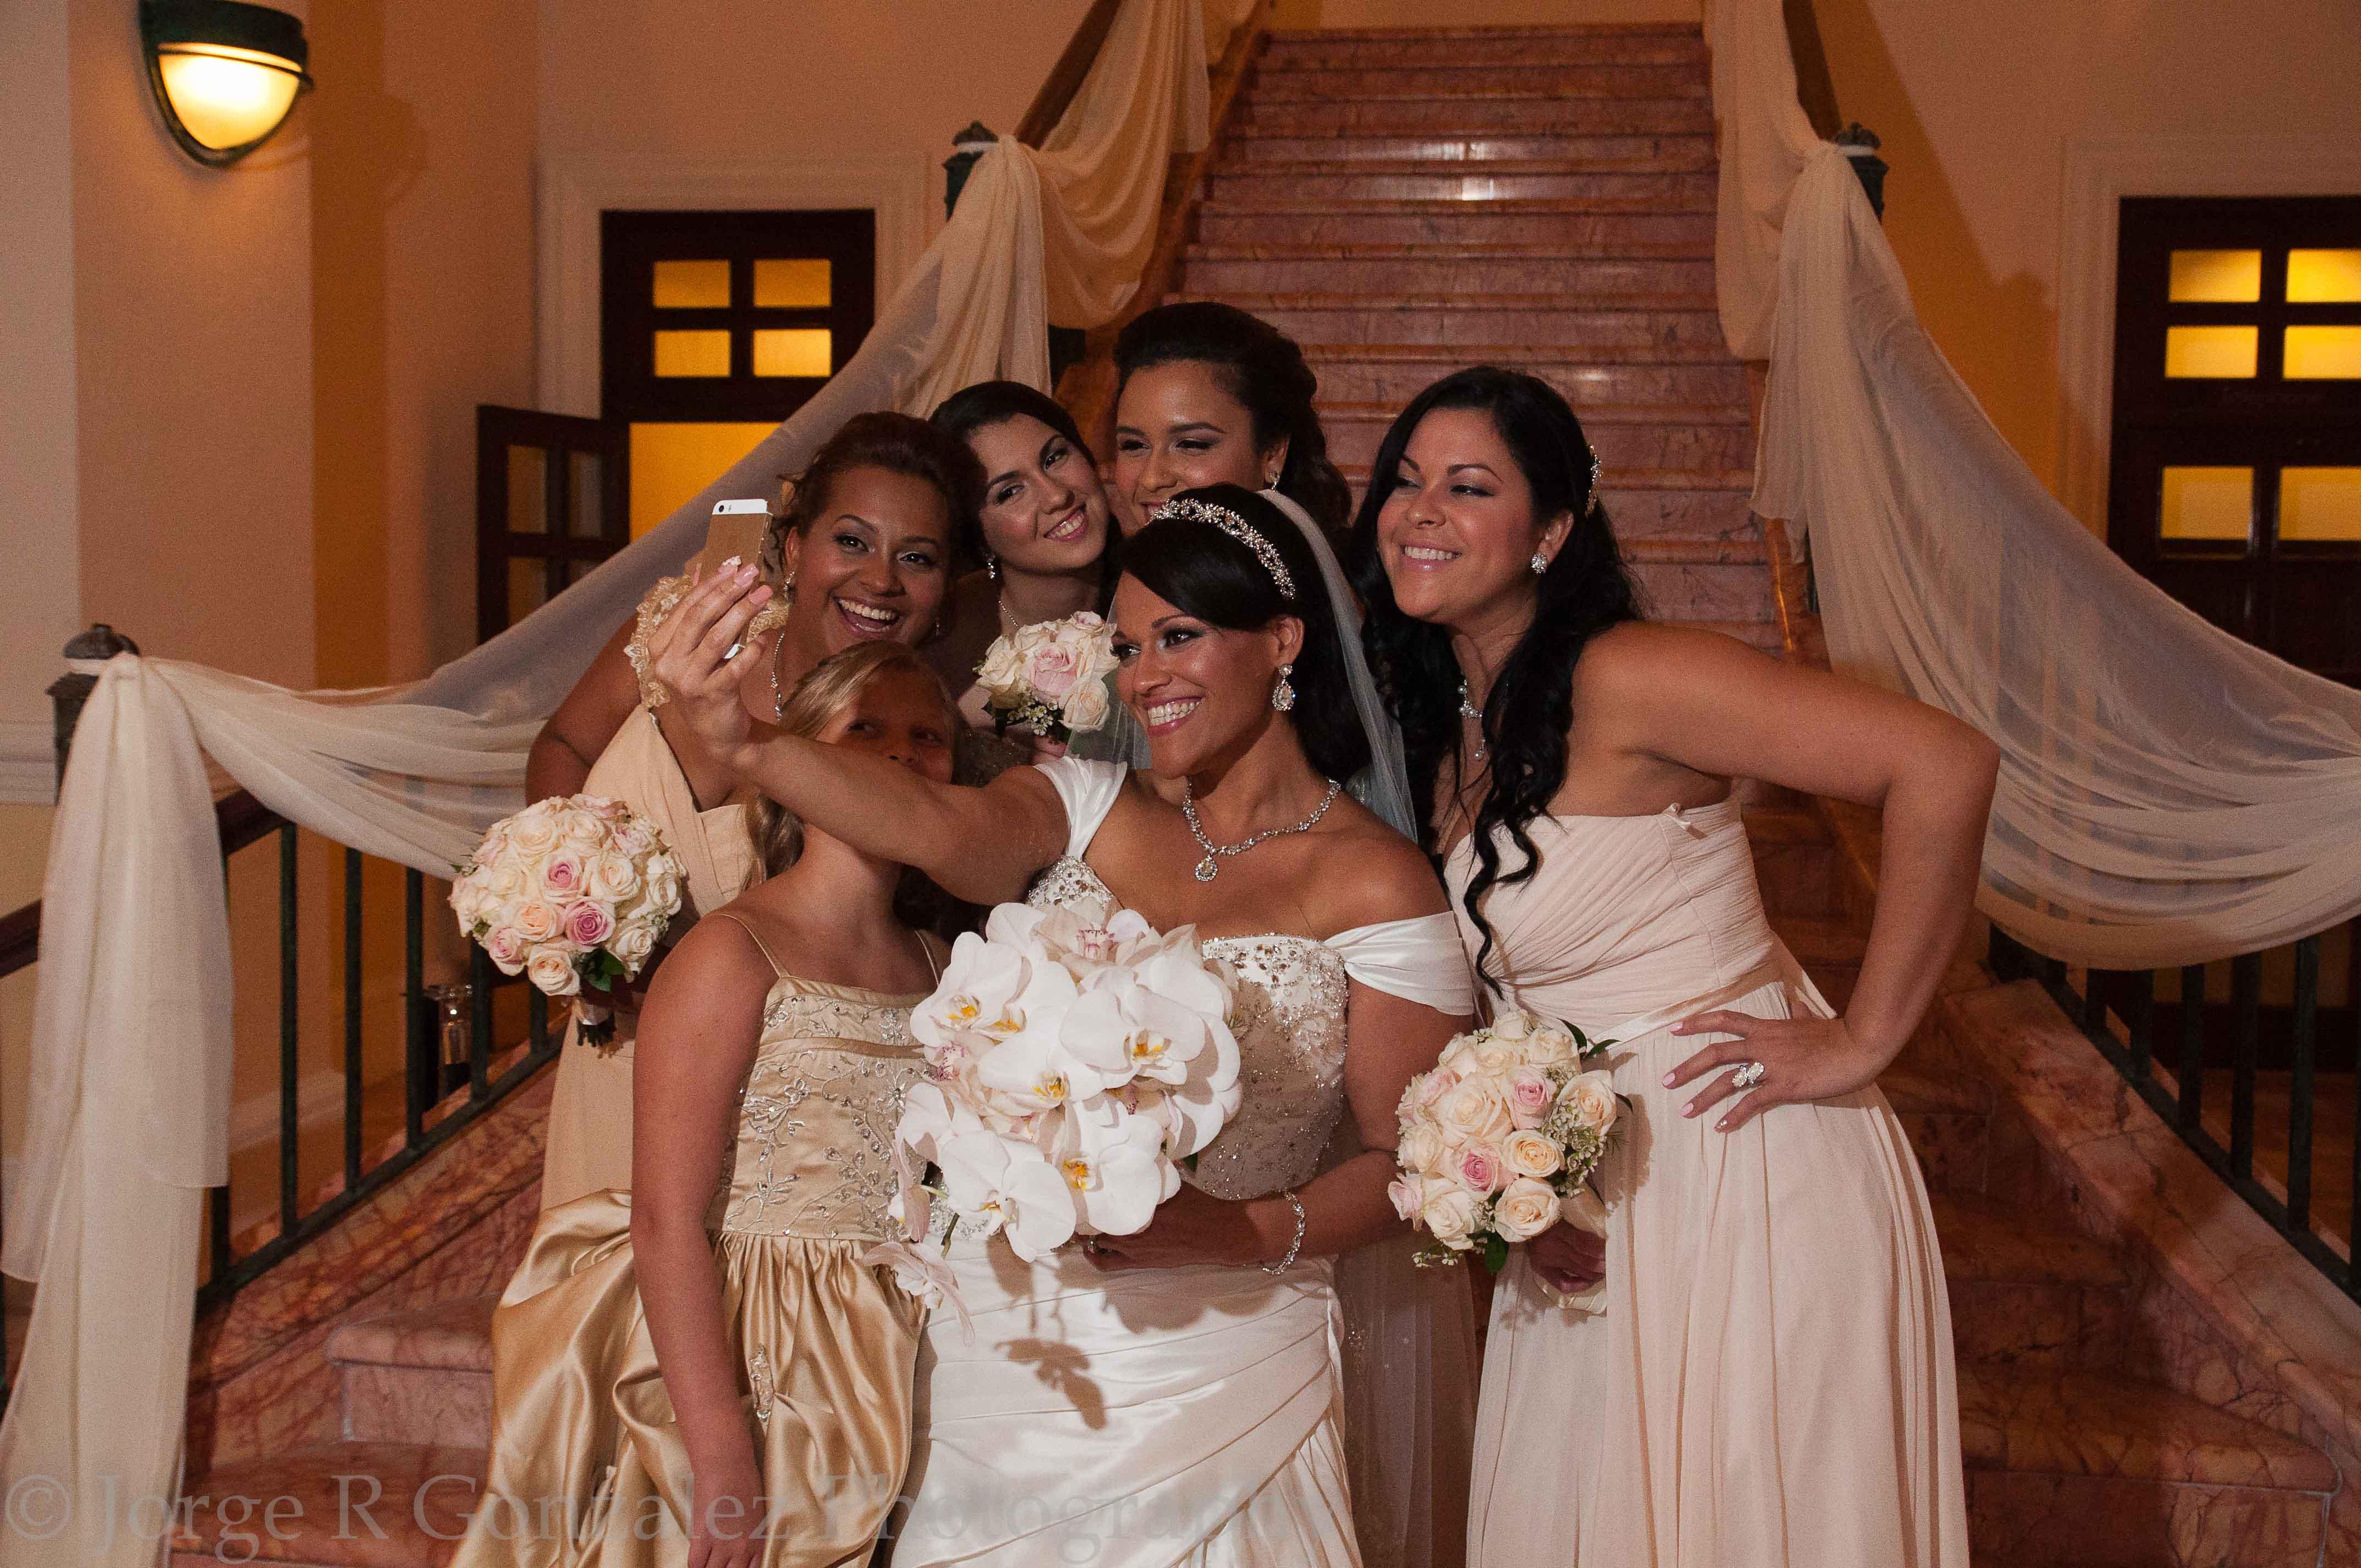 Wedding Decorations Miami Photography Jorgergonzalez